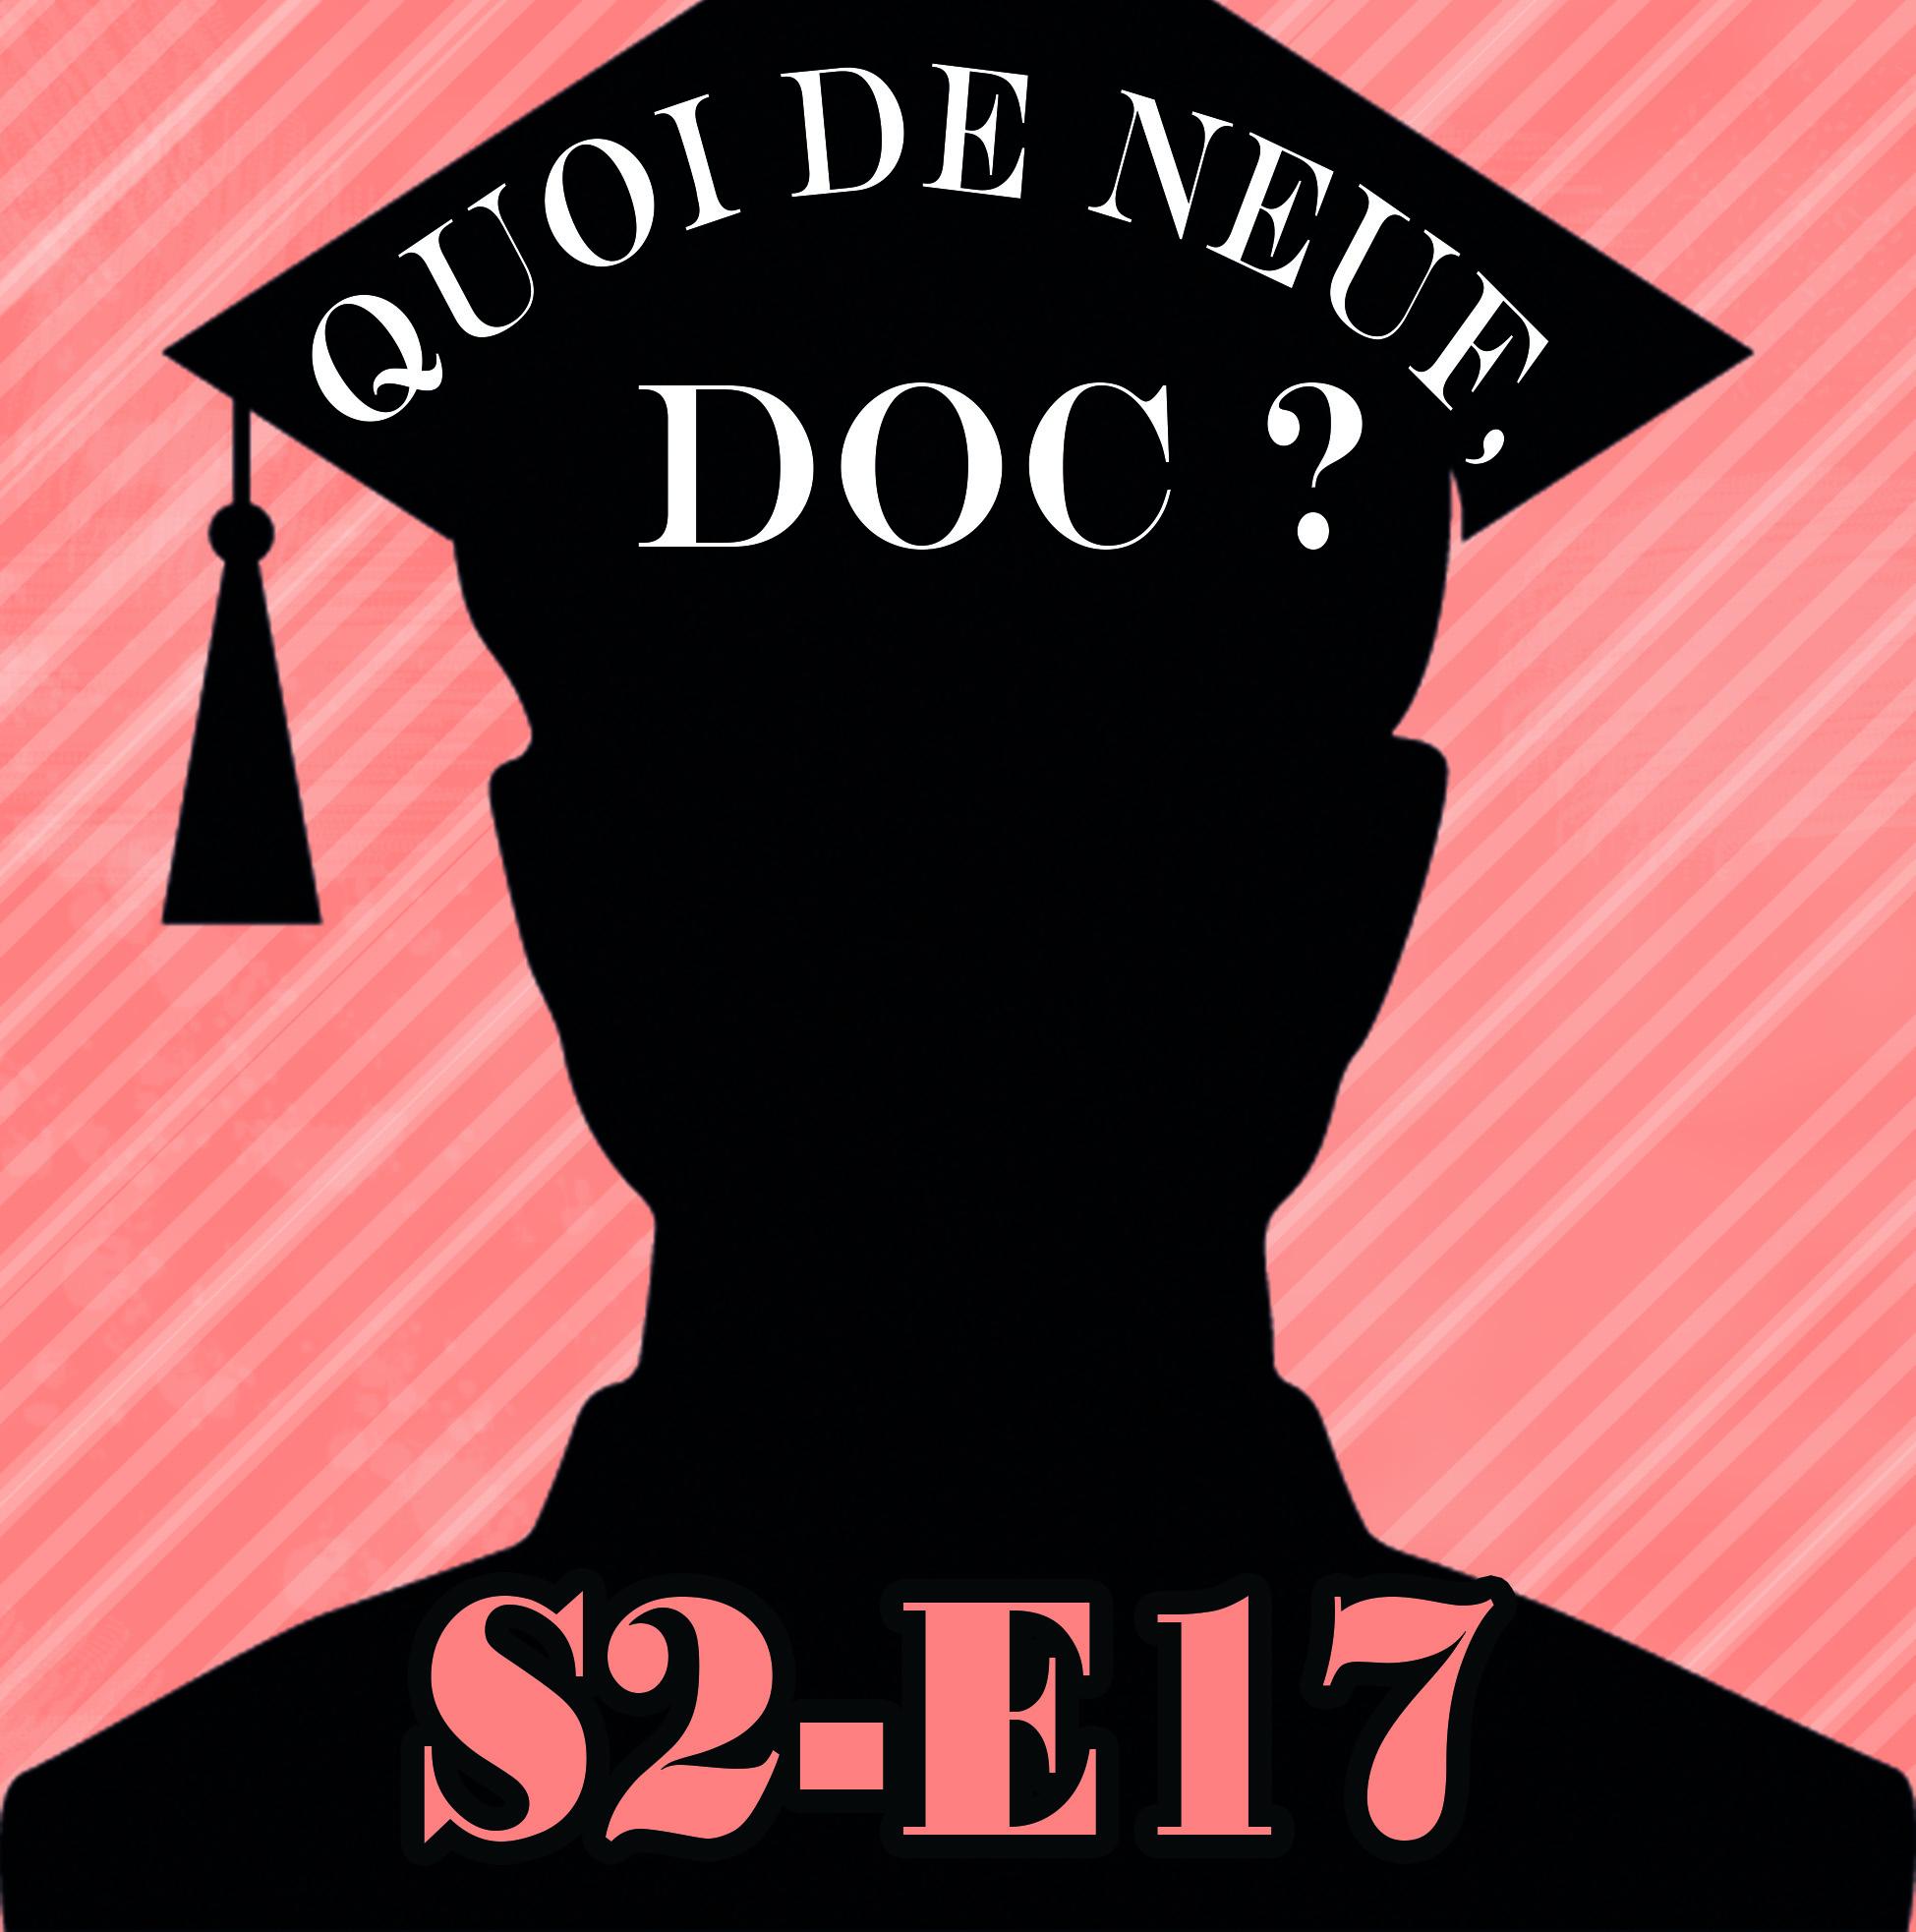 QDND S2E17 Emission du 18 mai